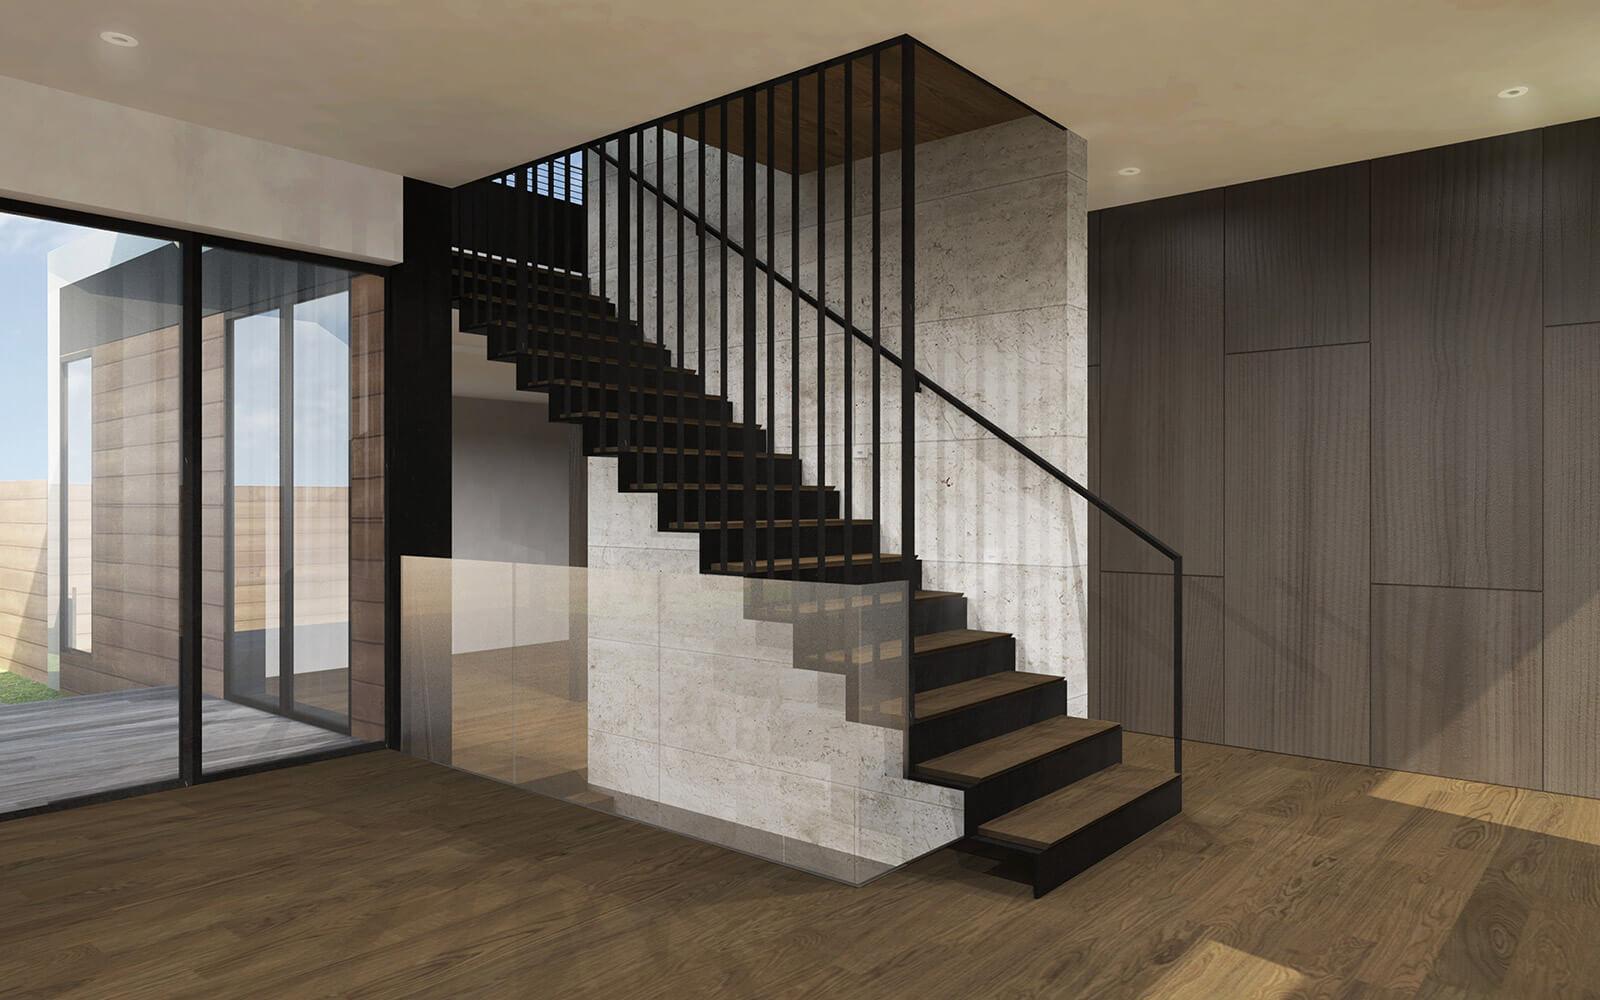 studio vara residential palo alto steel stair stone-slab wall